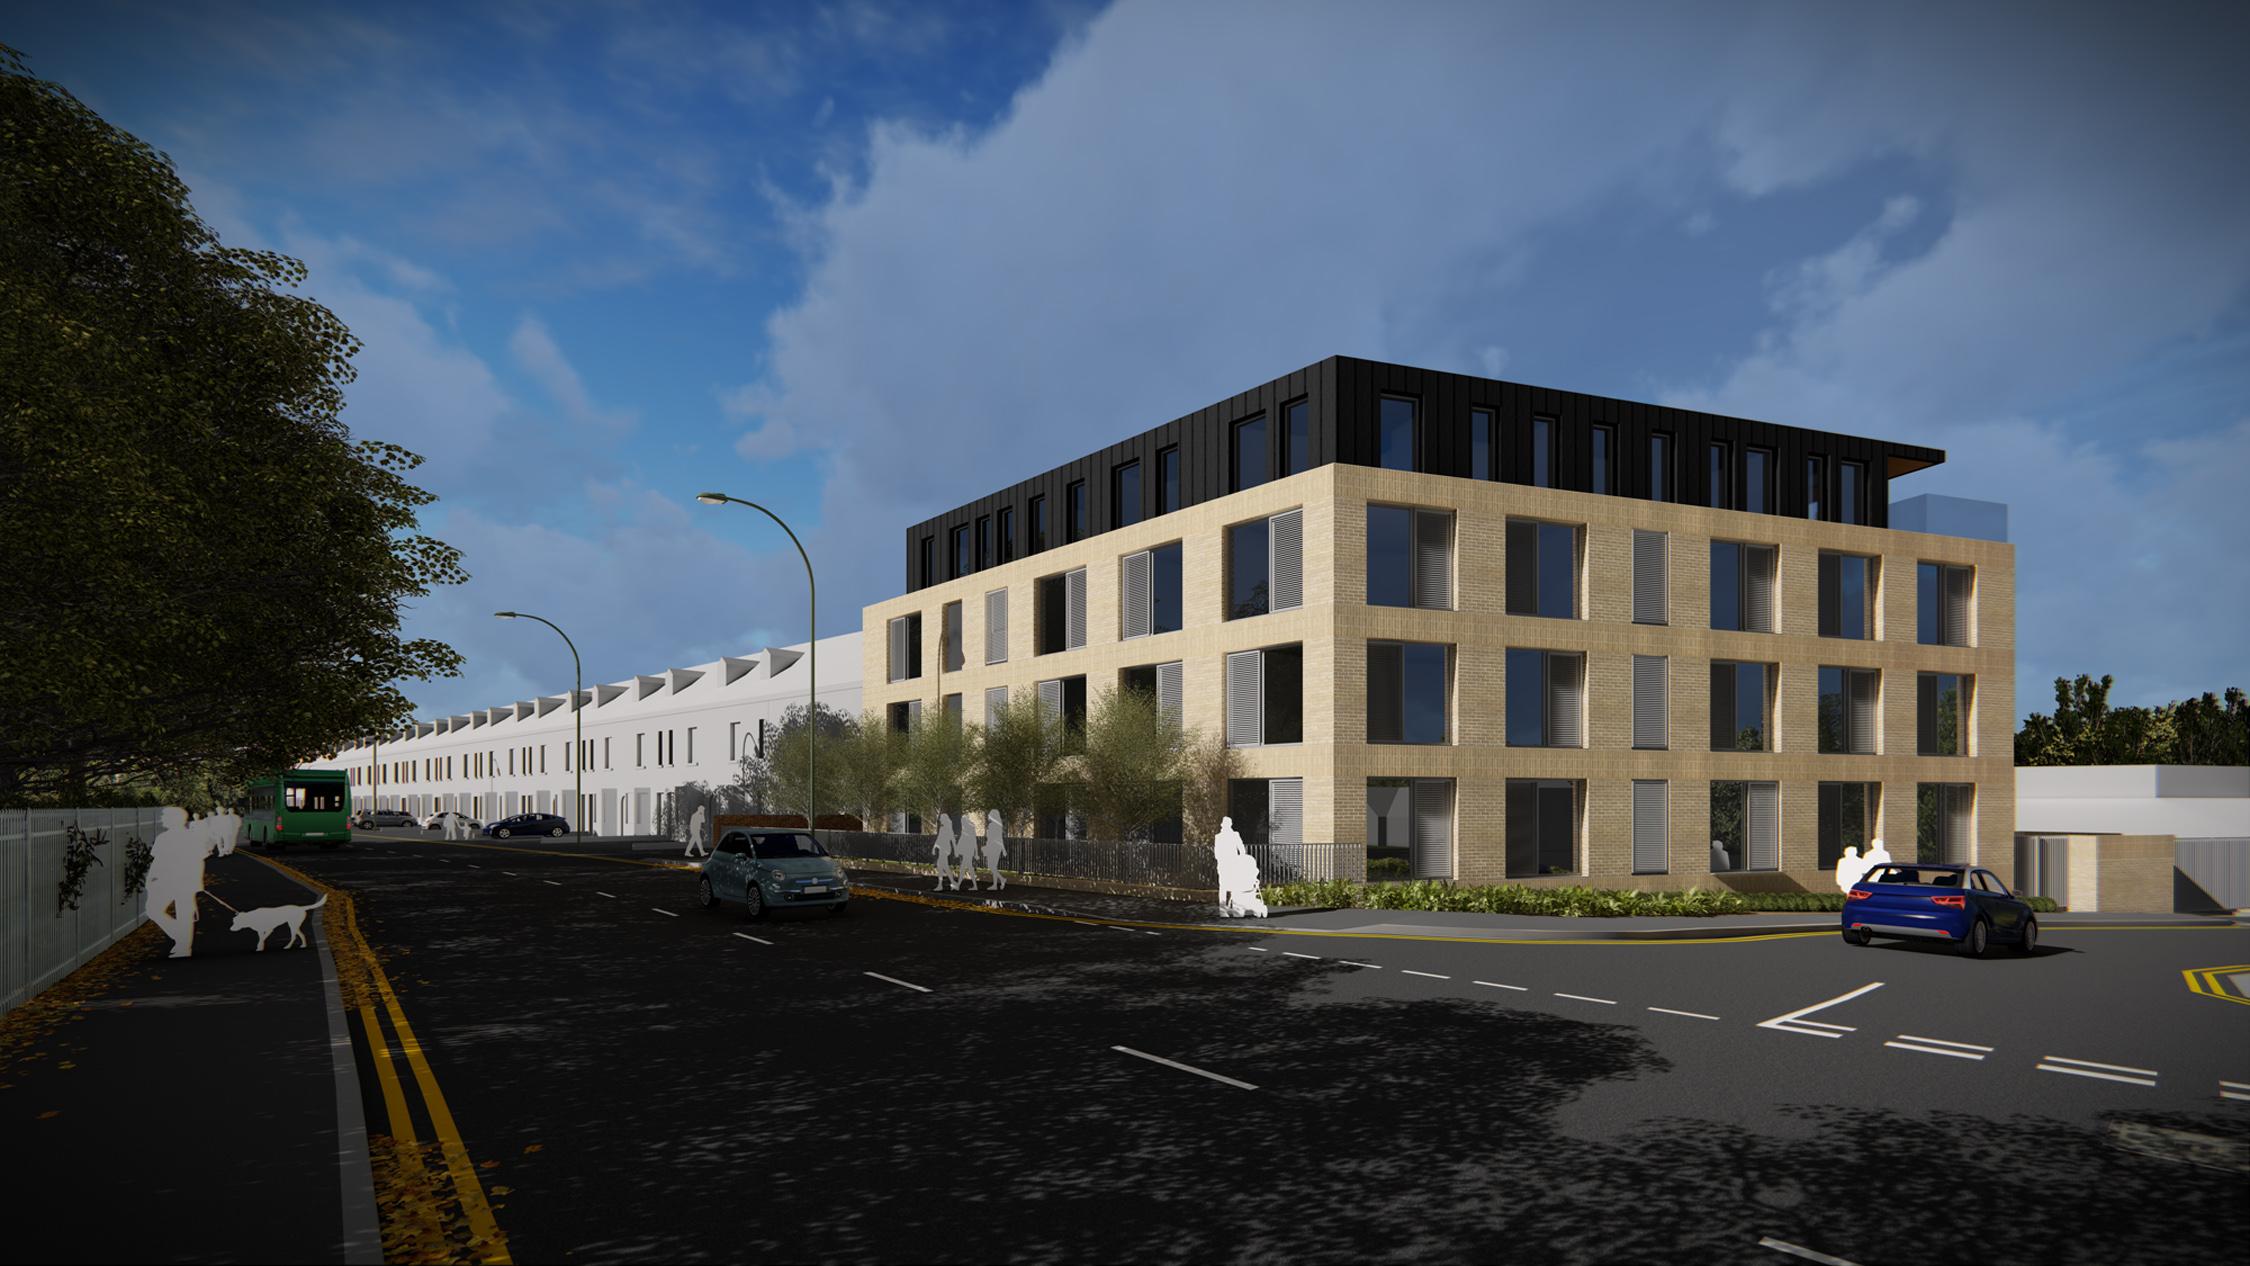 Kedleston_Road_Apartments_East_Facing.jpg